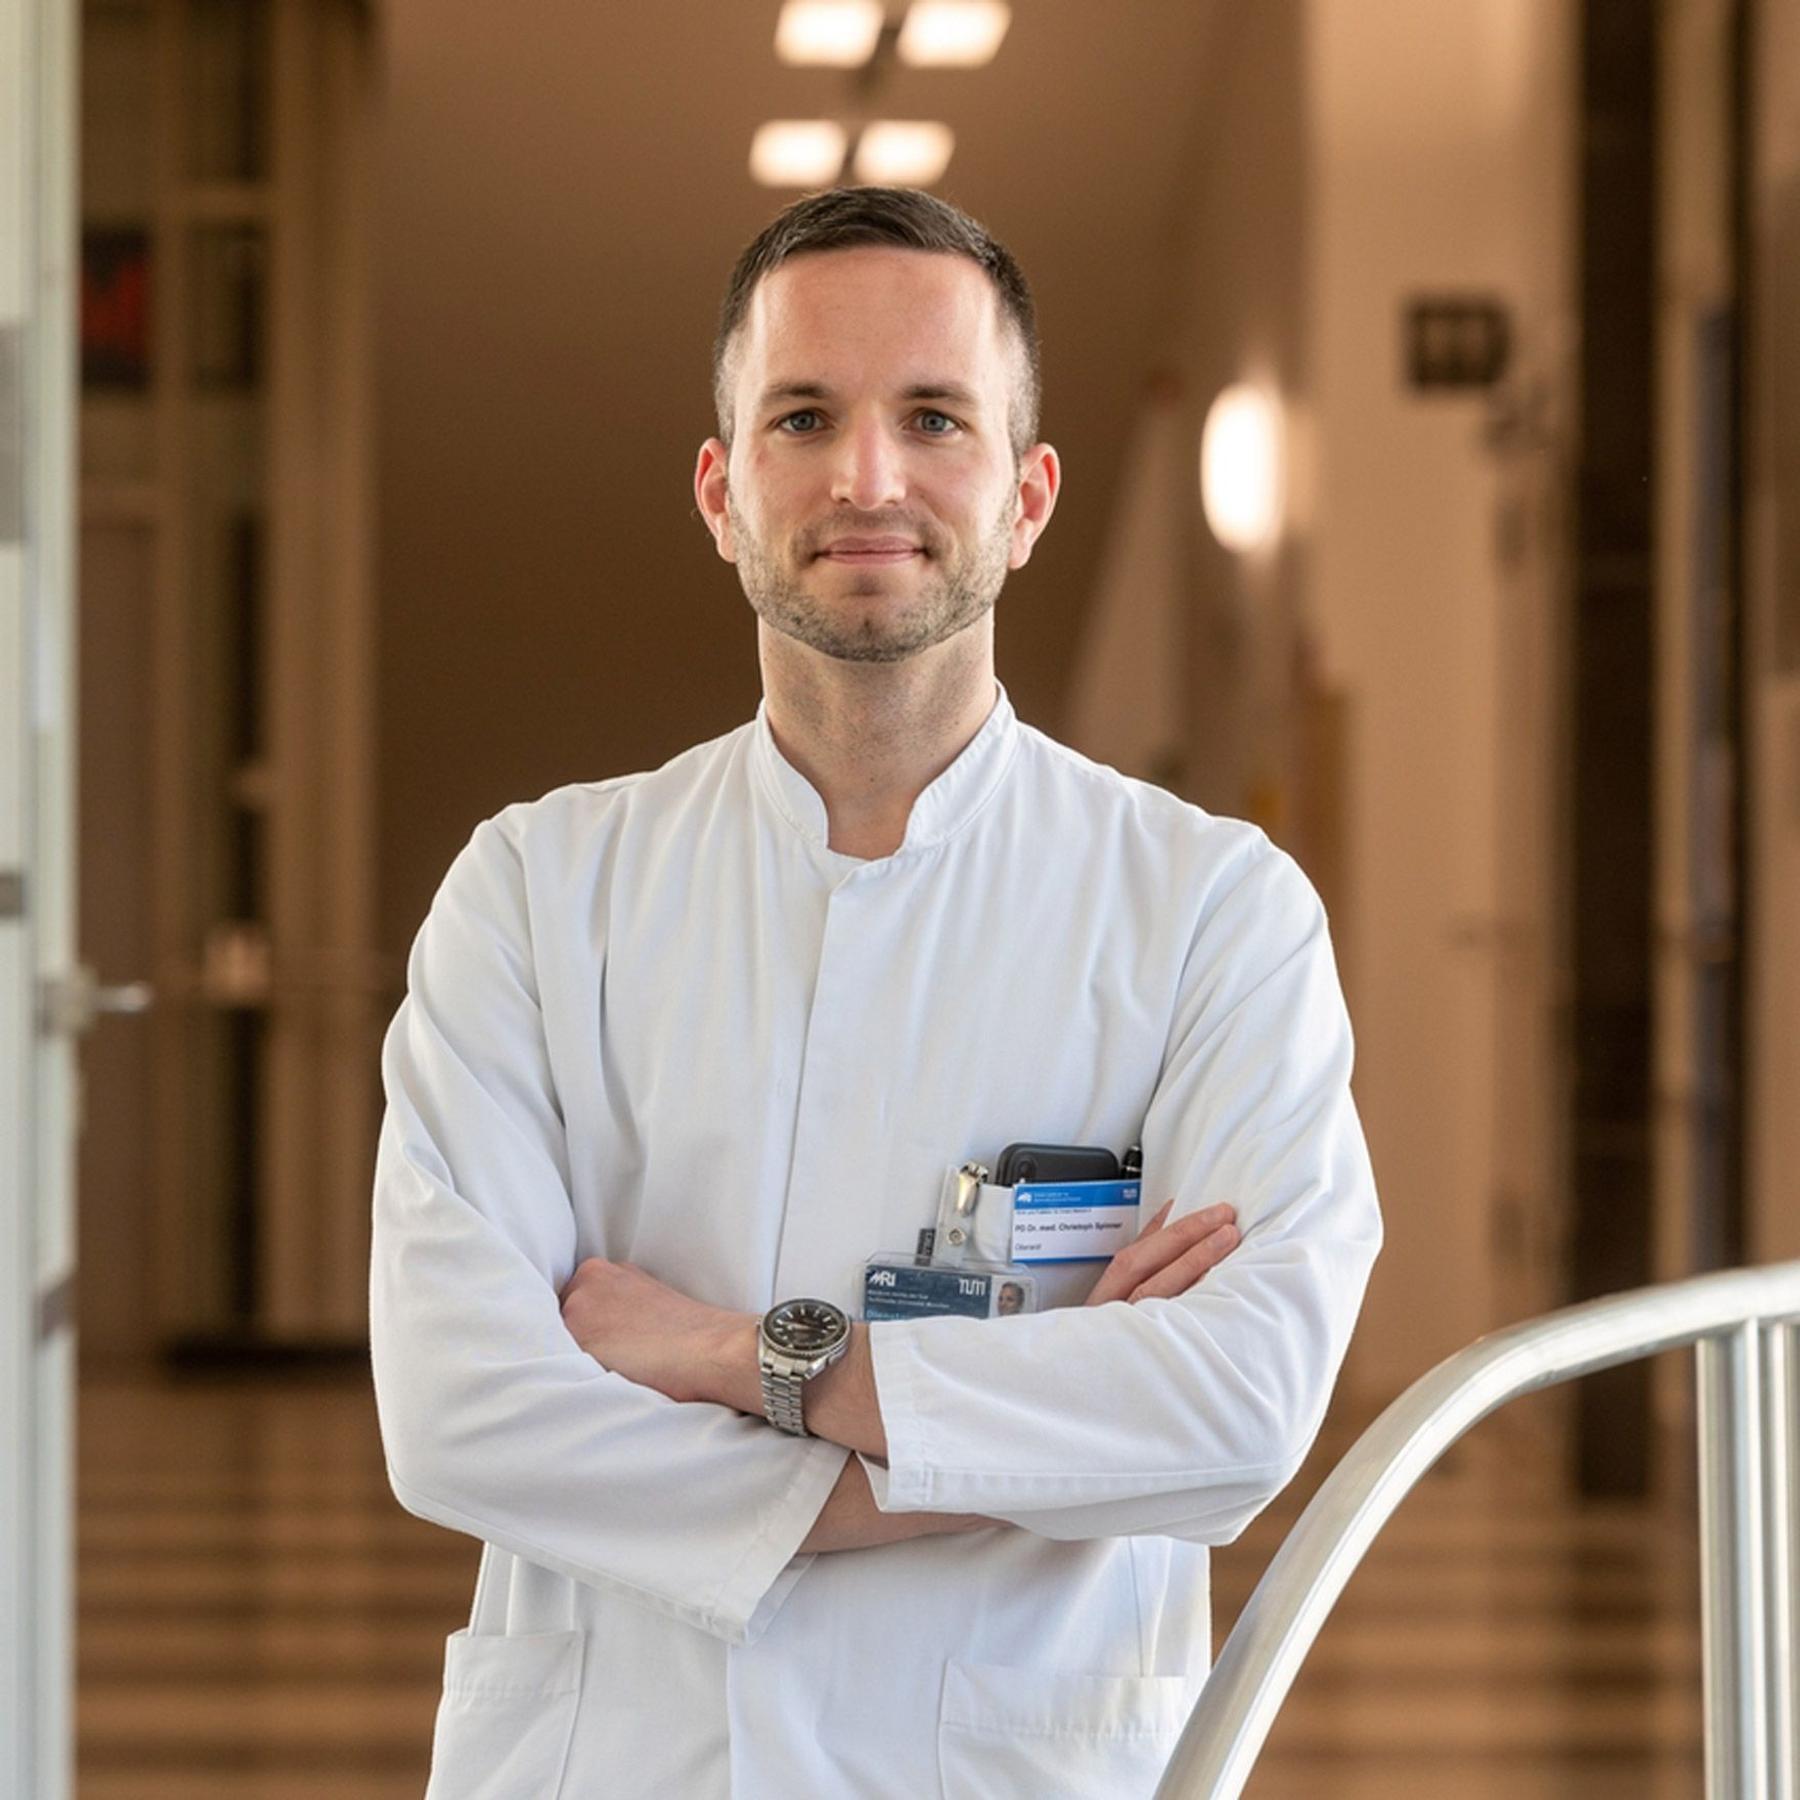 Corona-News mit Dr. Christoph Spinner